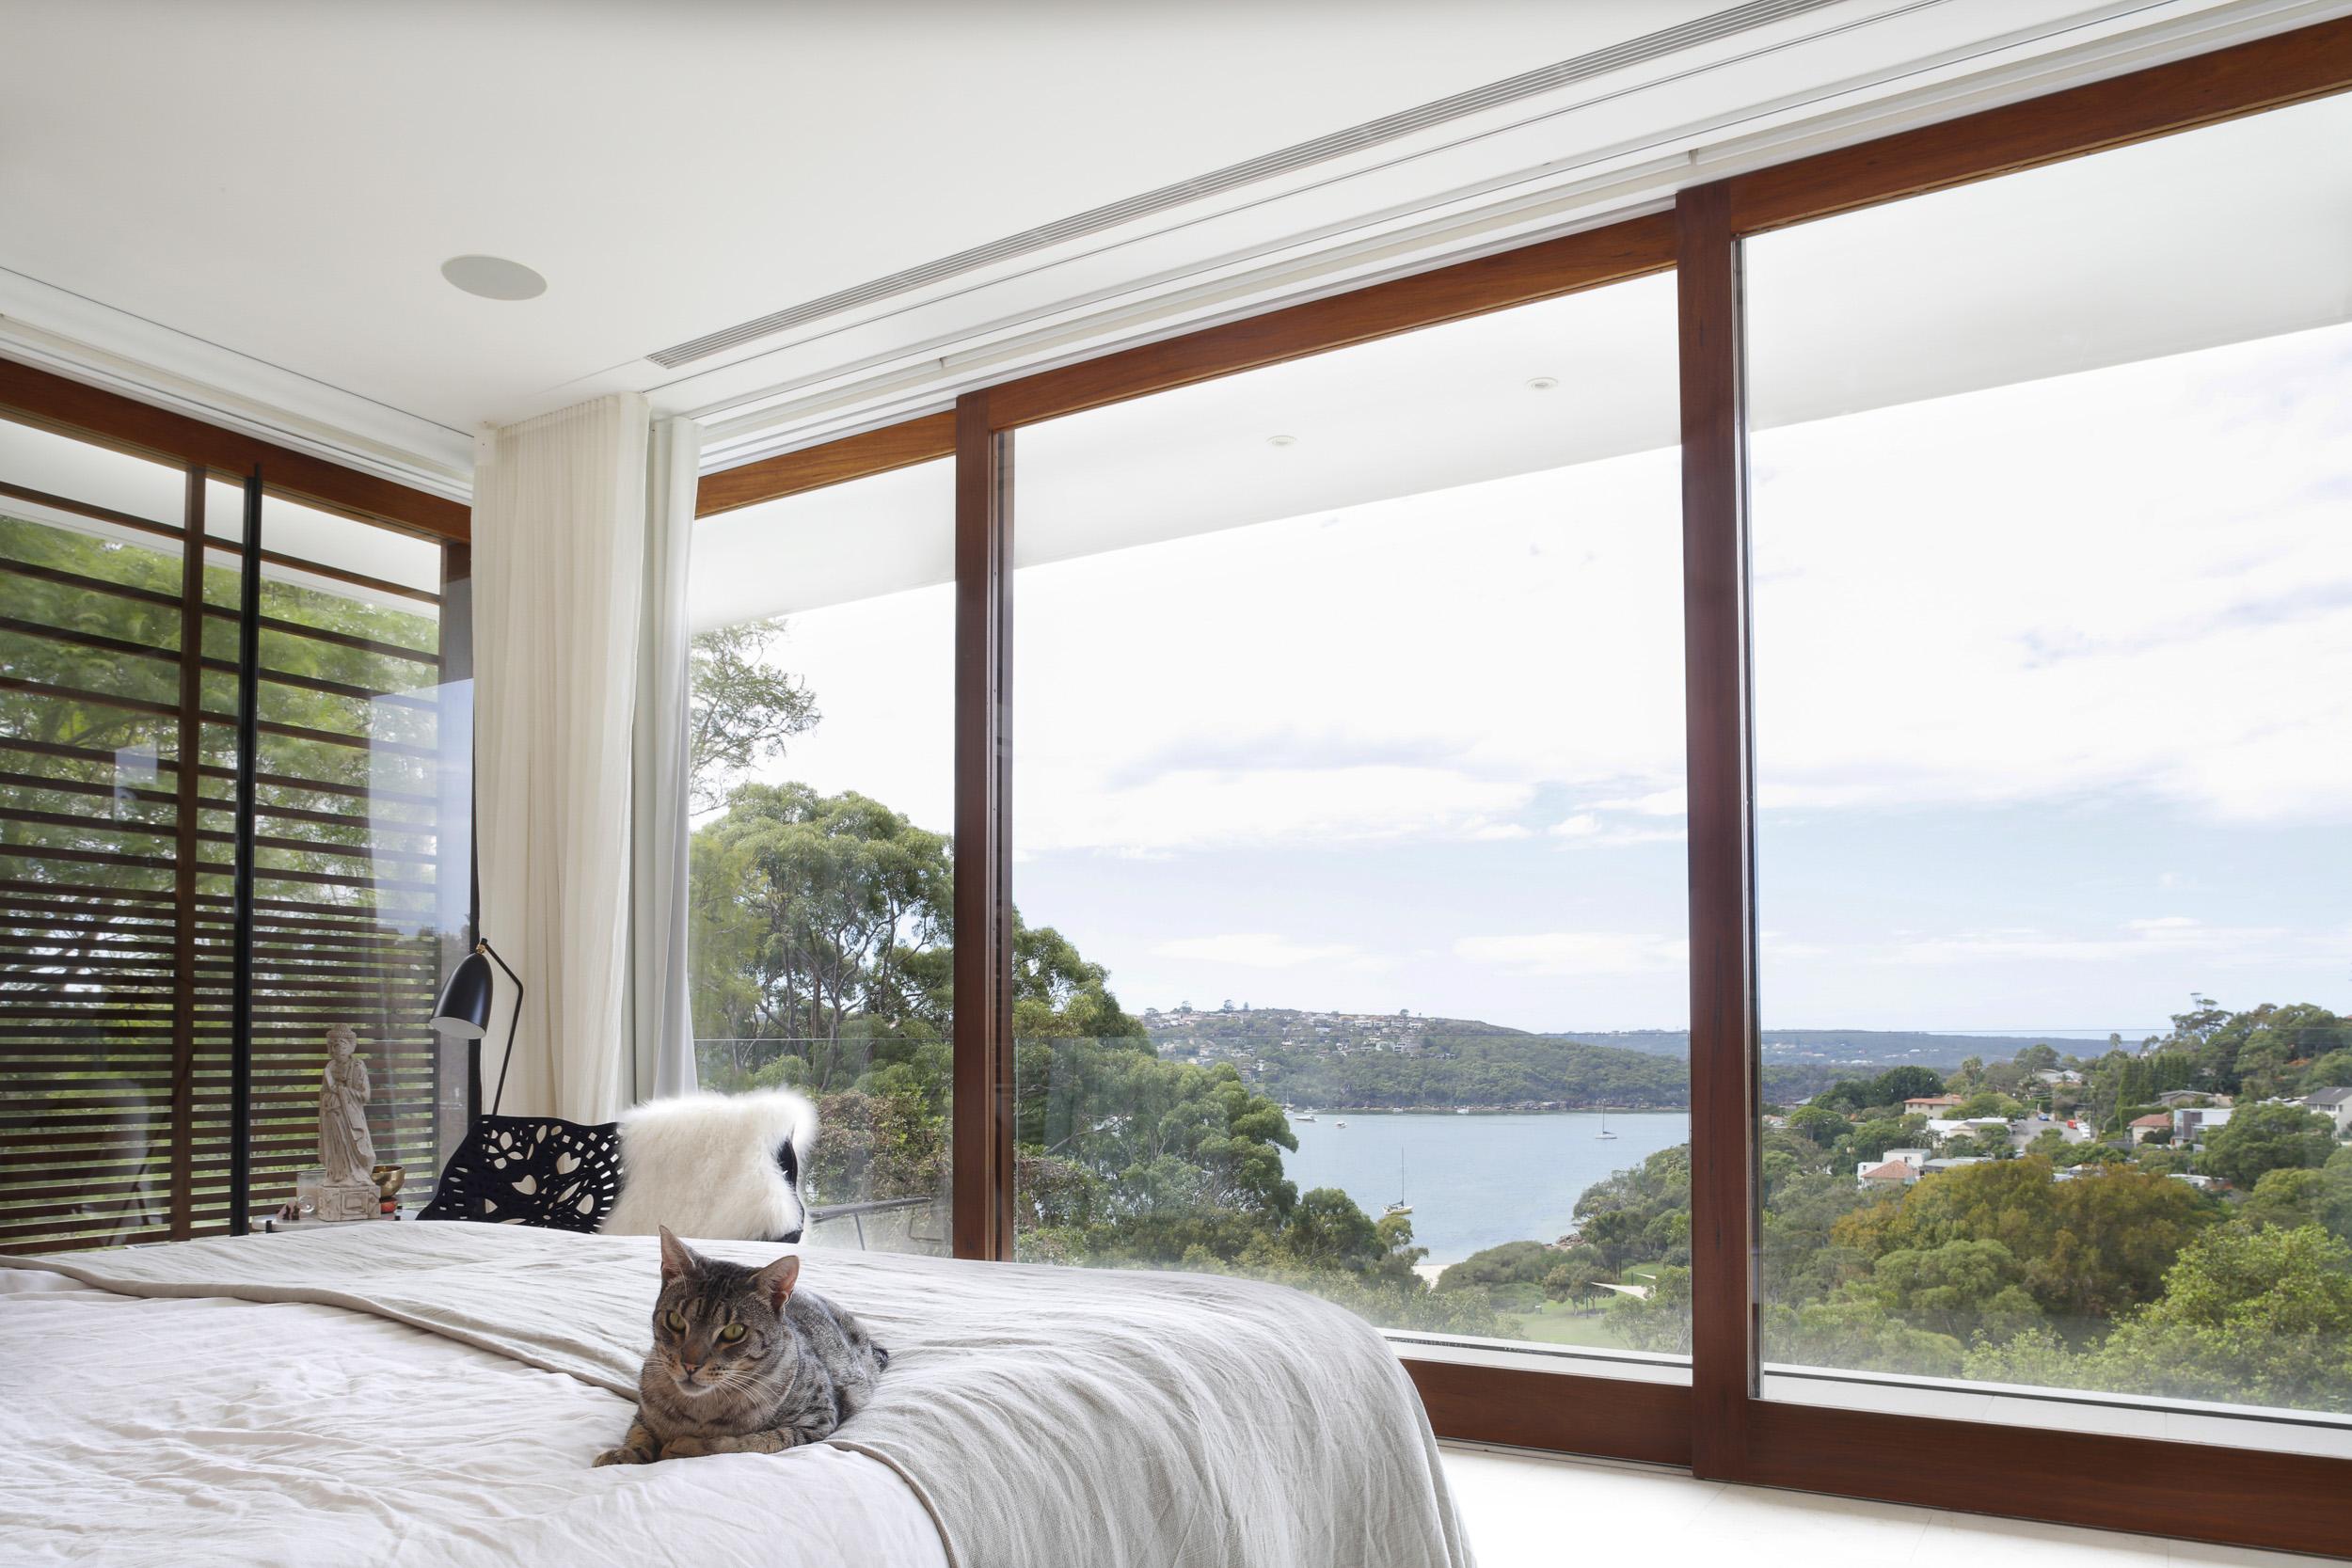 residential_architect_photographer_sydney_31.jpg